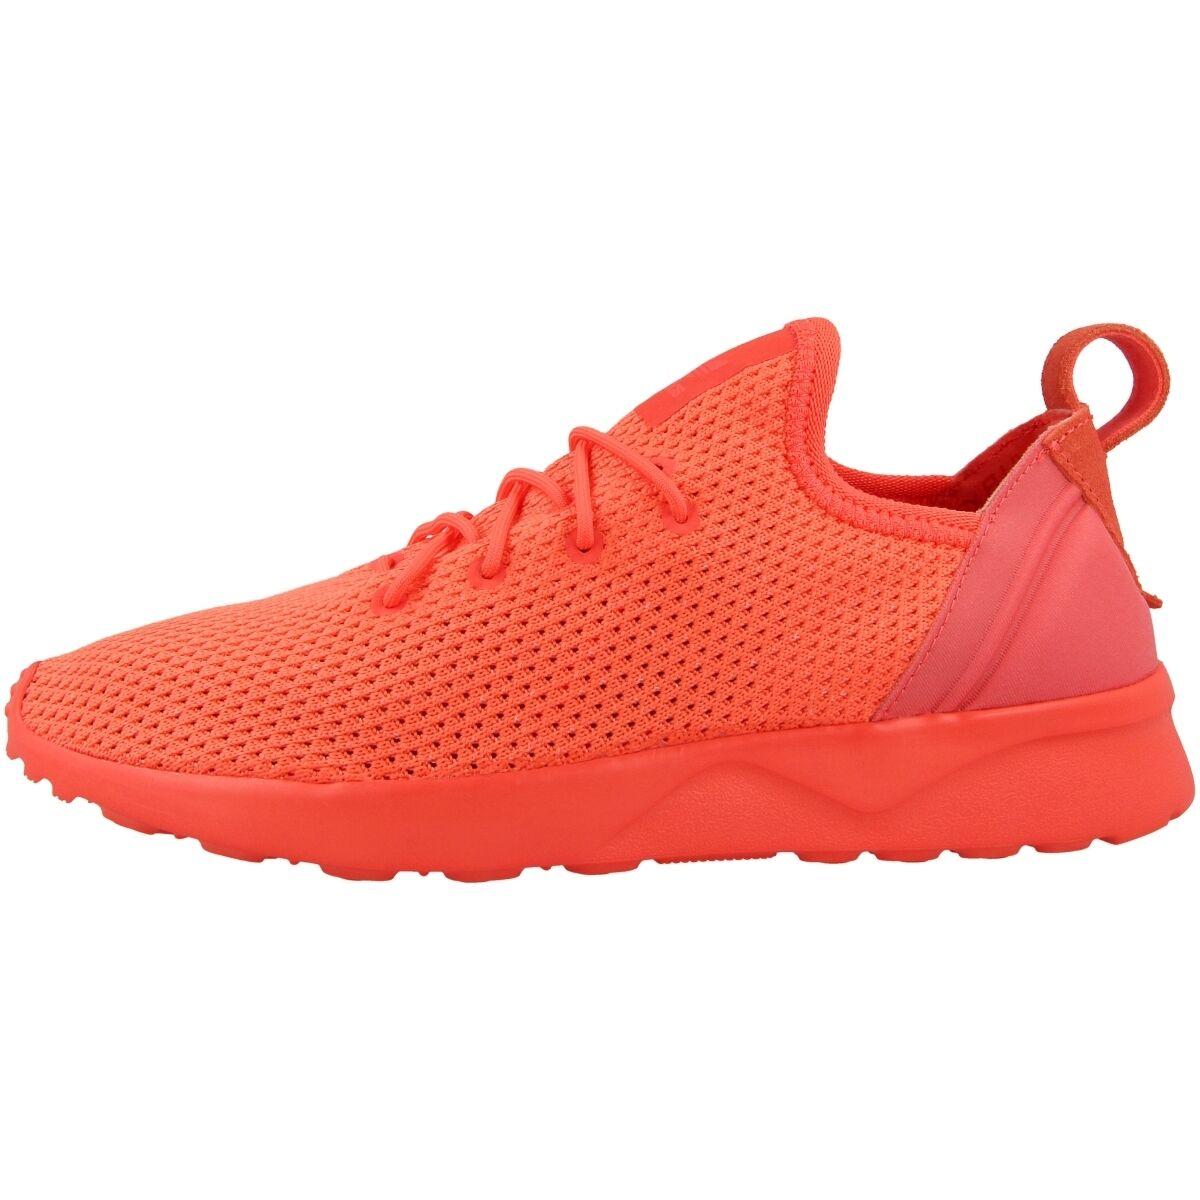 best website f2595 98ee2 ... 50% off adidas flux zx flux adidas adv virtue sock mujer zapatos cortos  señora coral